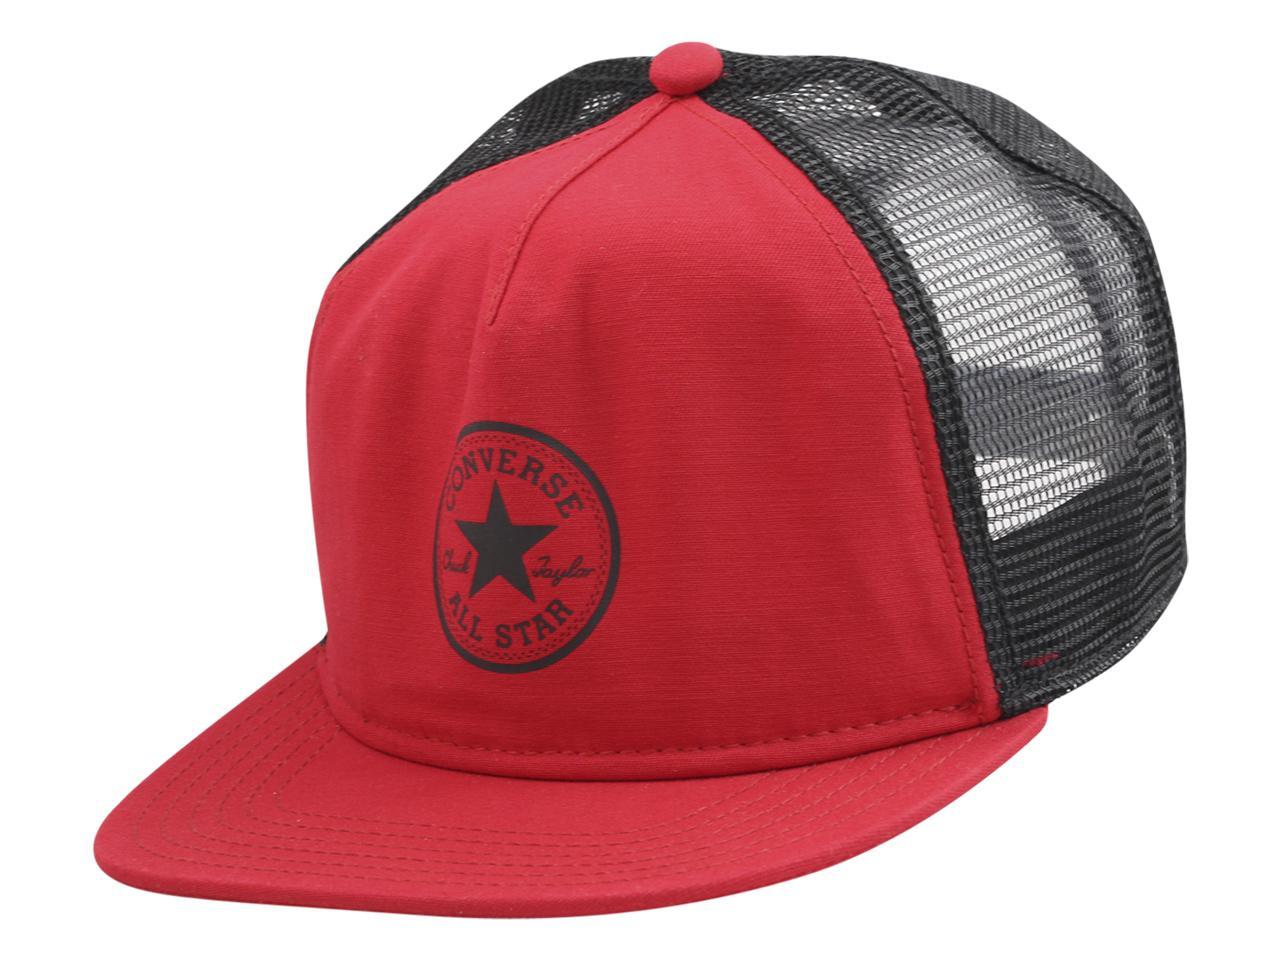 19140a7261b Converse Men s All Star Chuck Taylor Core Trucker Cap Baseball Hat (One  Size)